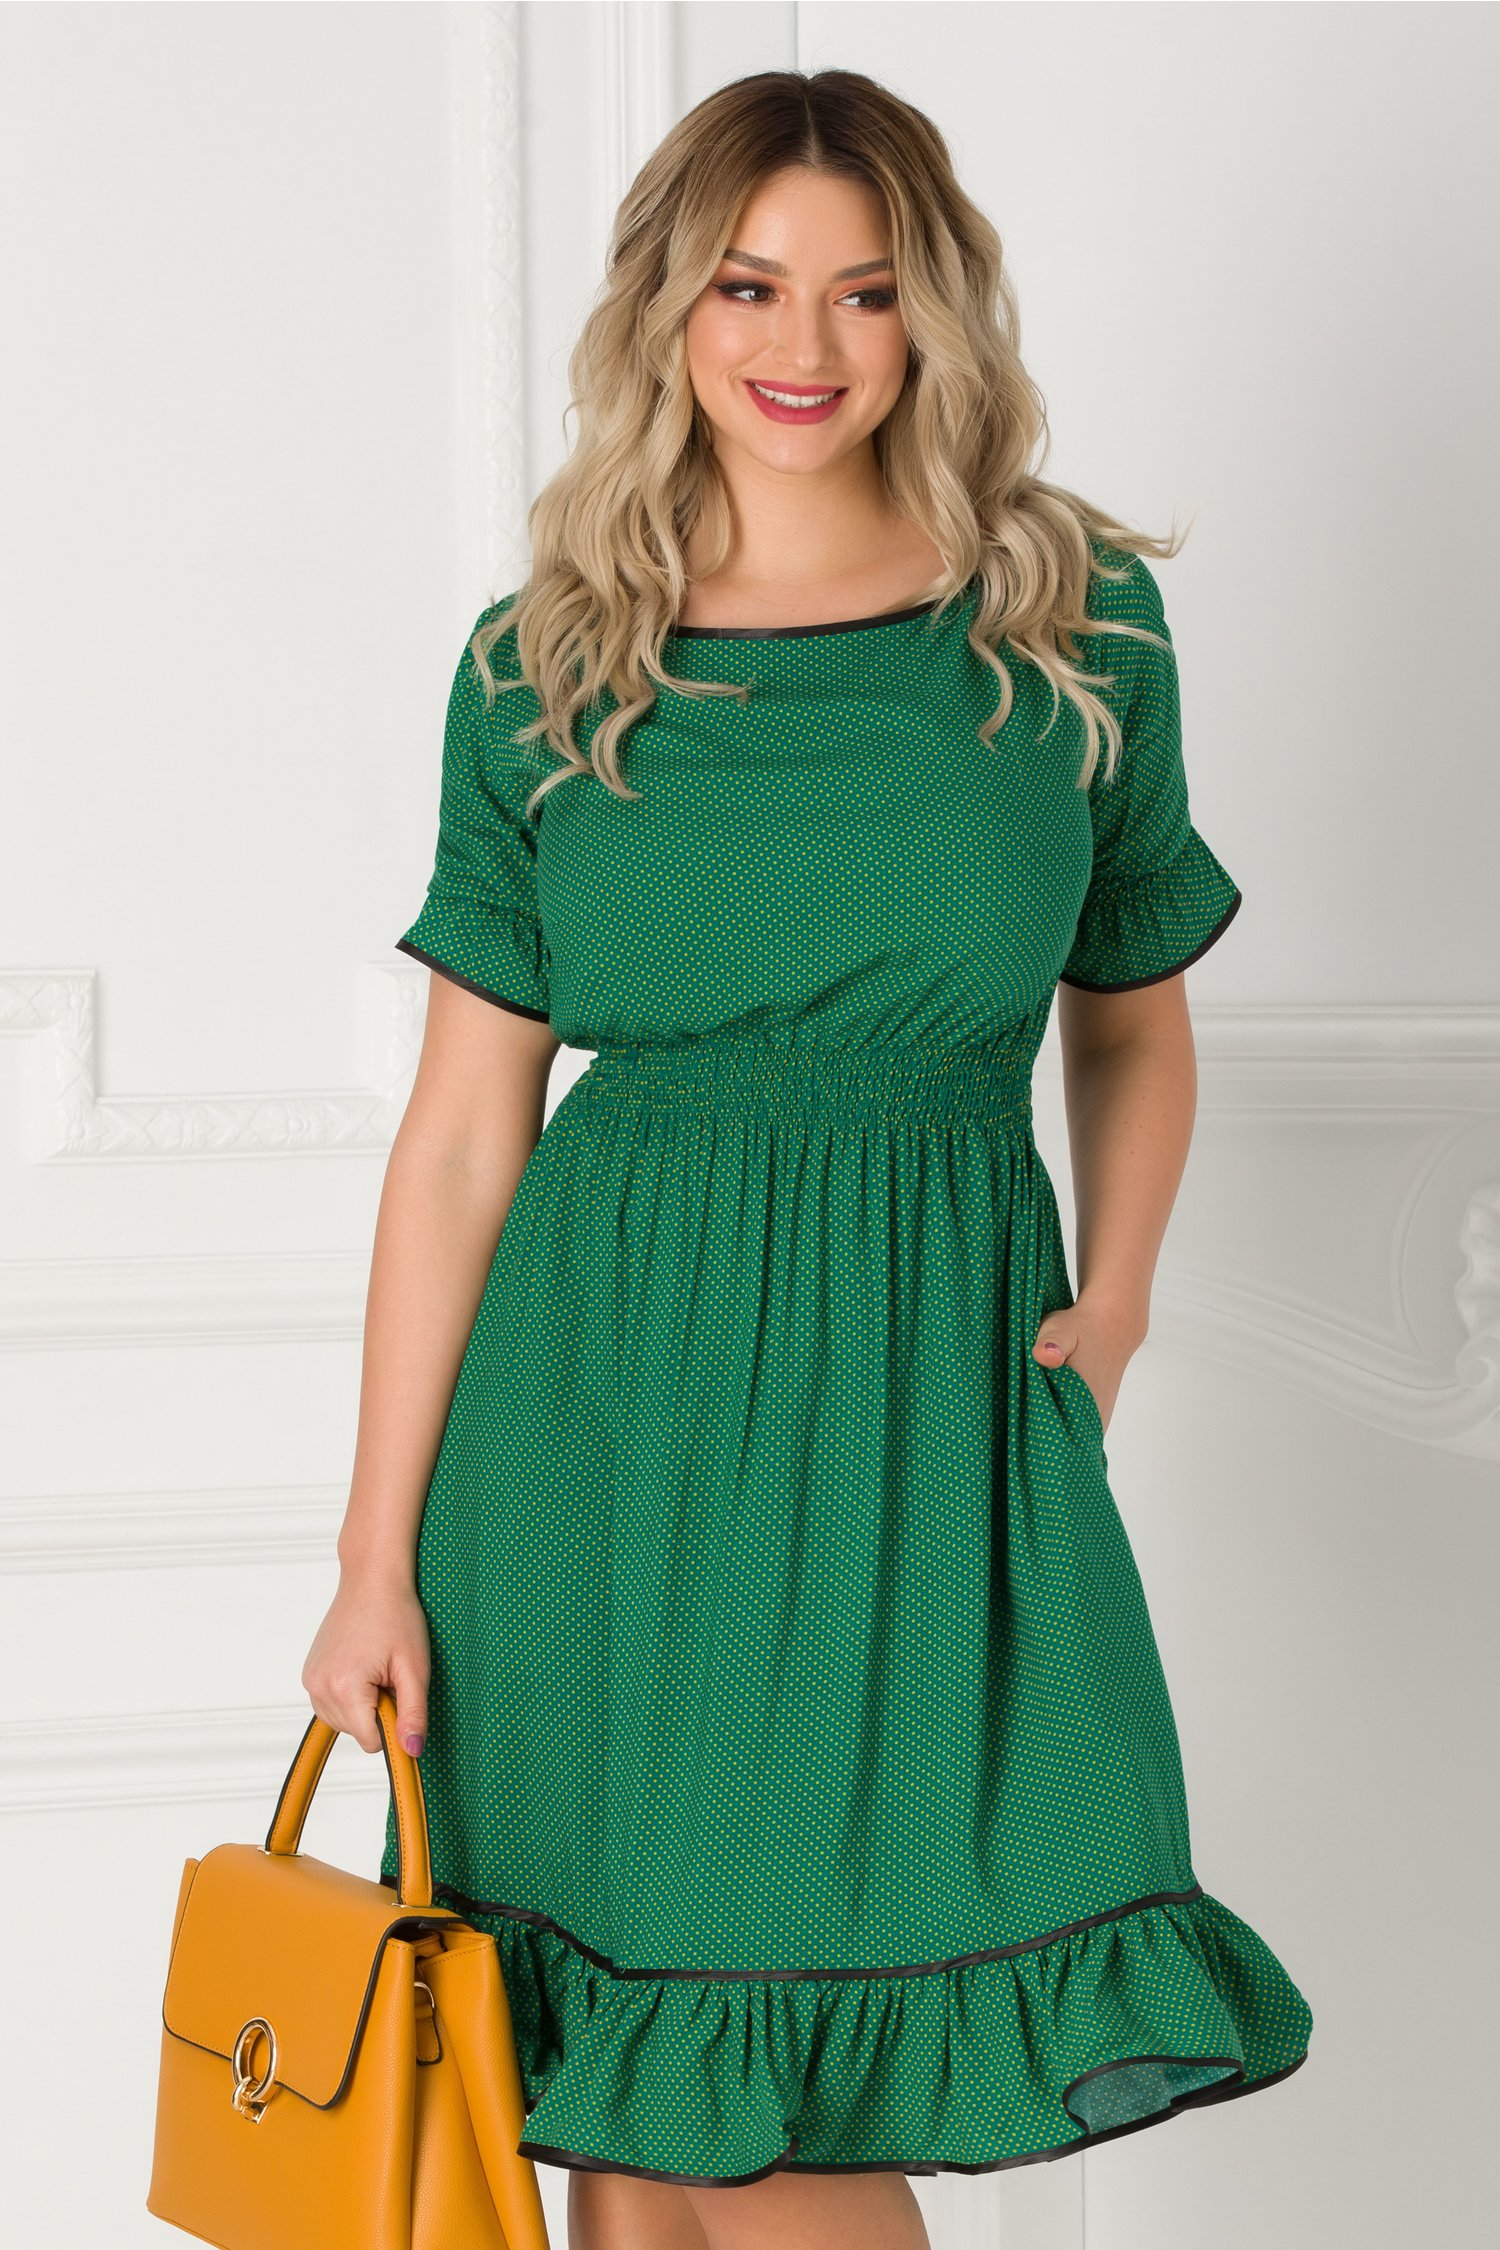 Rochie Natalia verde cu buline galbene